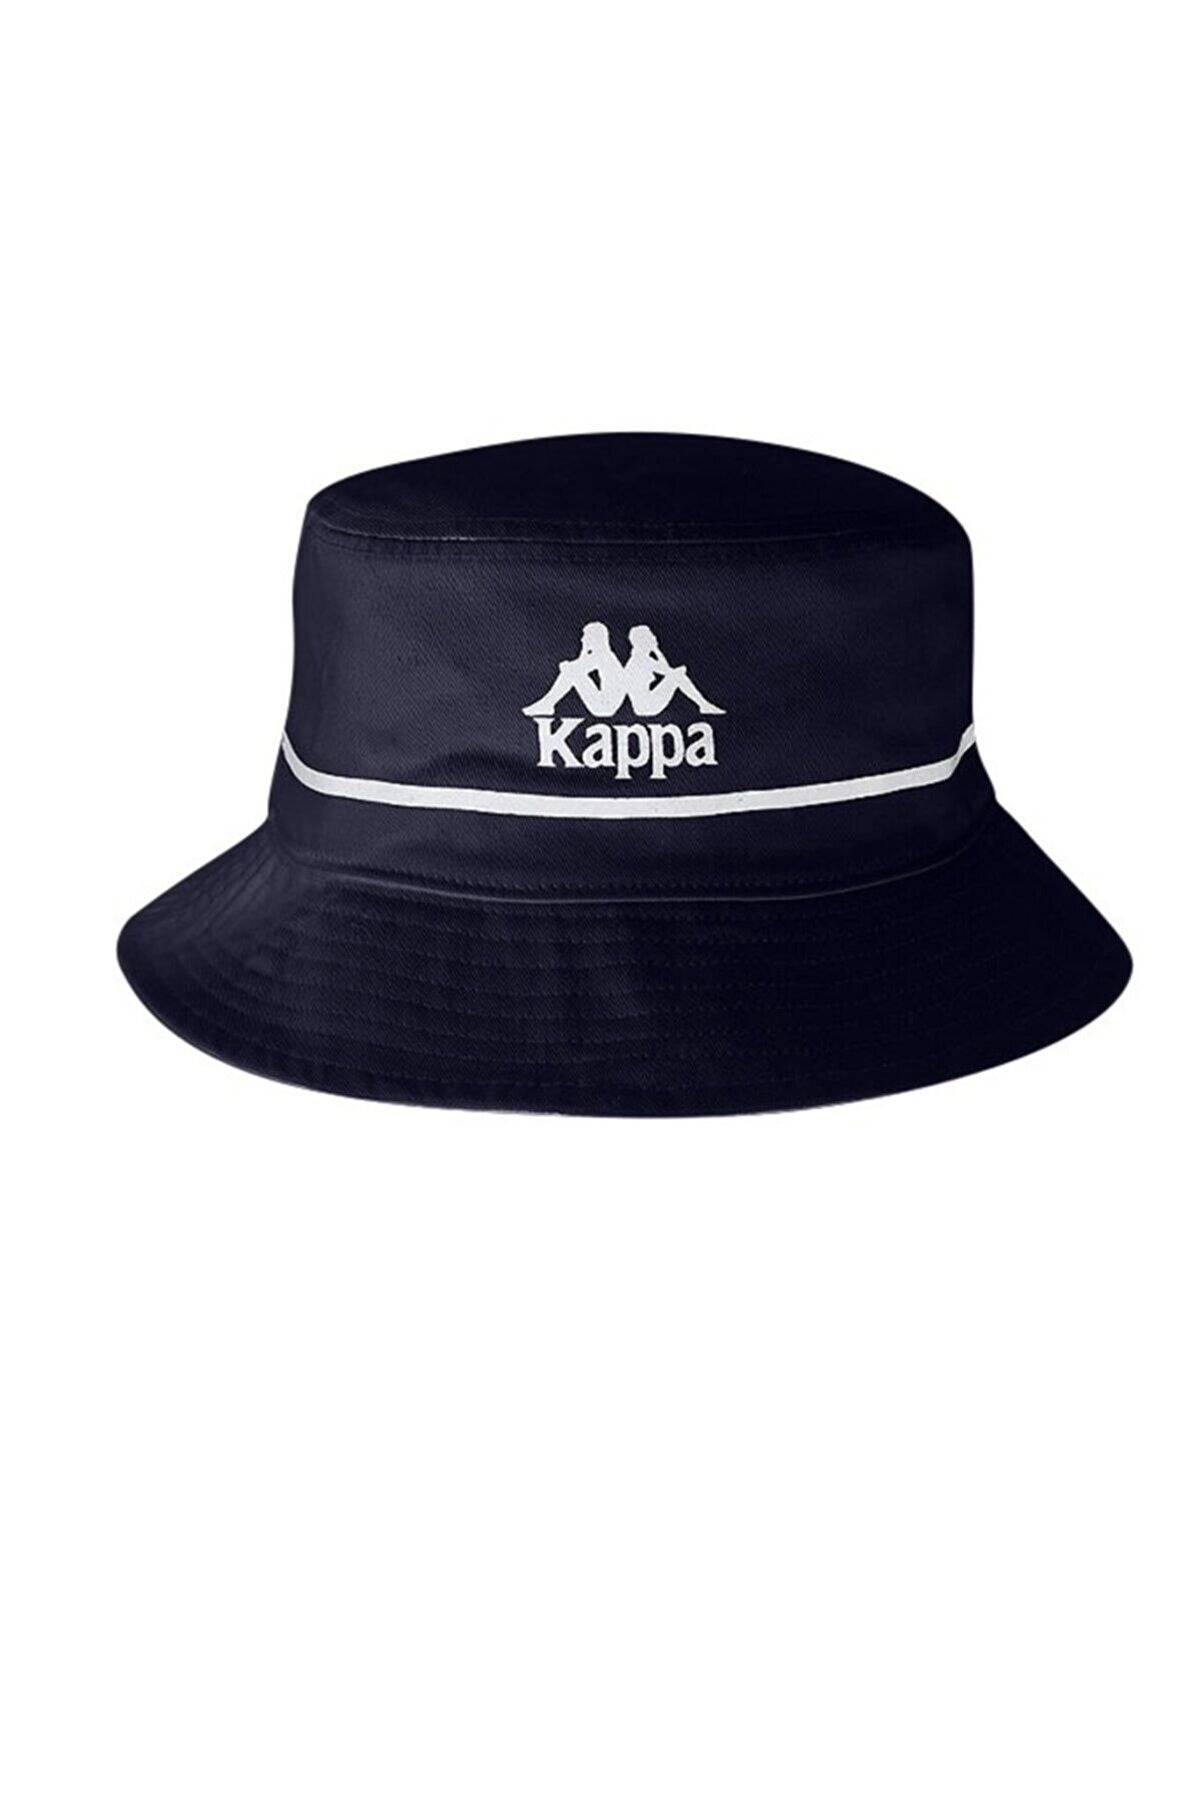 Kappa Kadın Safari Şapka